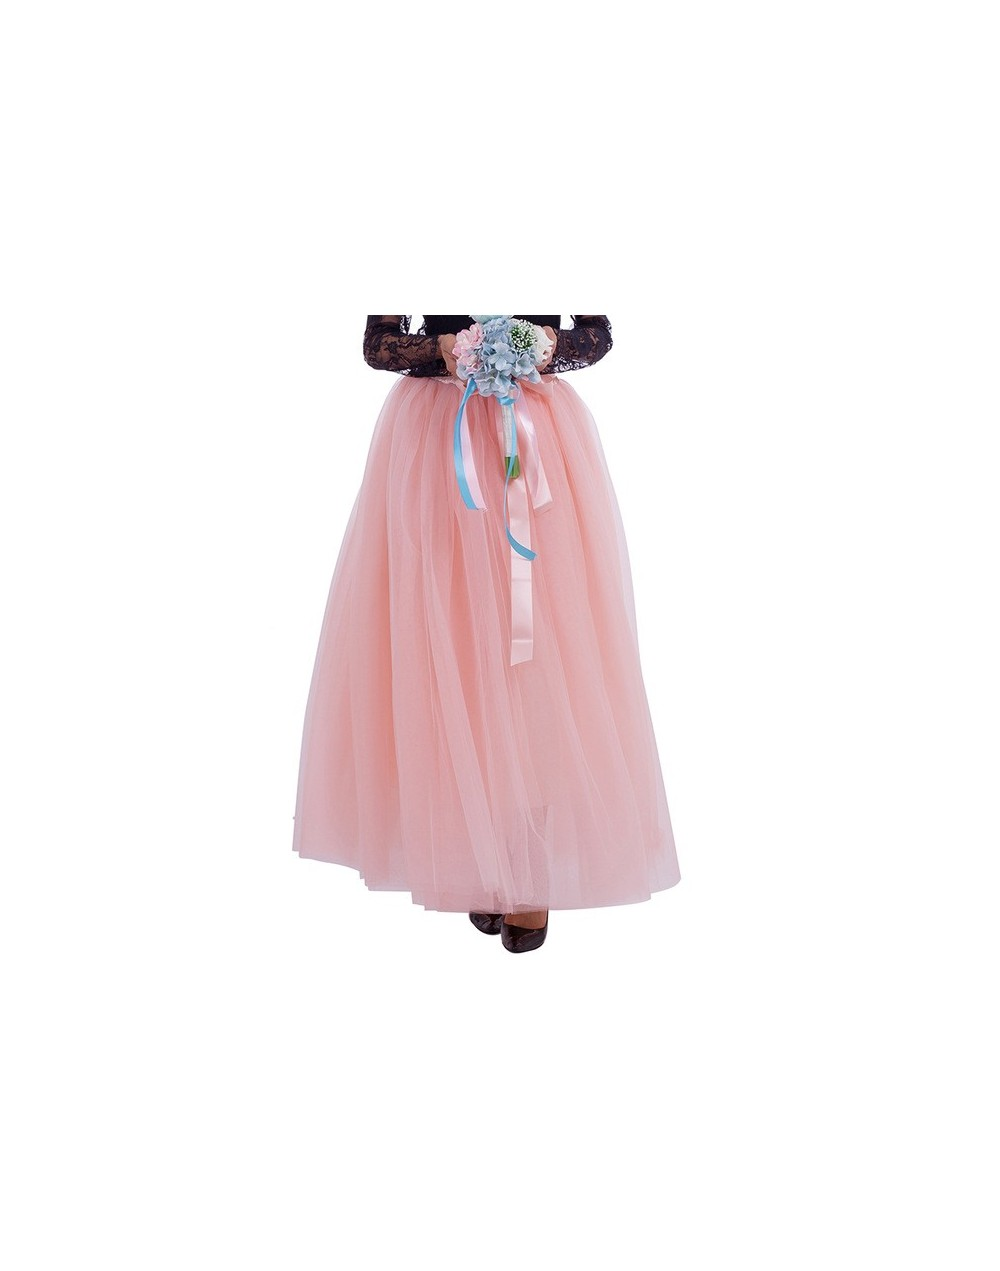 7 Layers 100cm Long Tulle Skirts Women Floor-Length Pleated Skirt Fashion Wedding Bridal Bridesmaid Skirt Faldas Jupe Saias ...